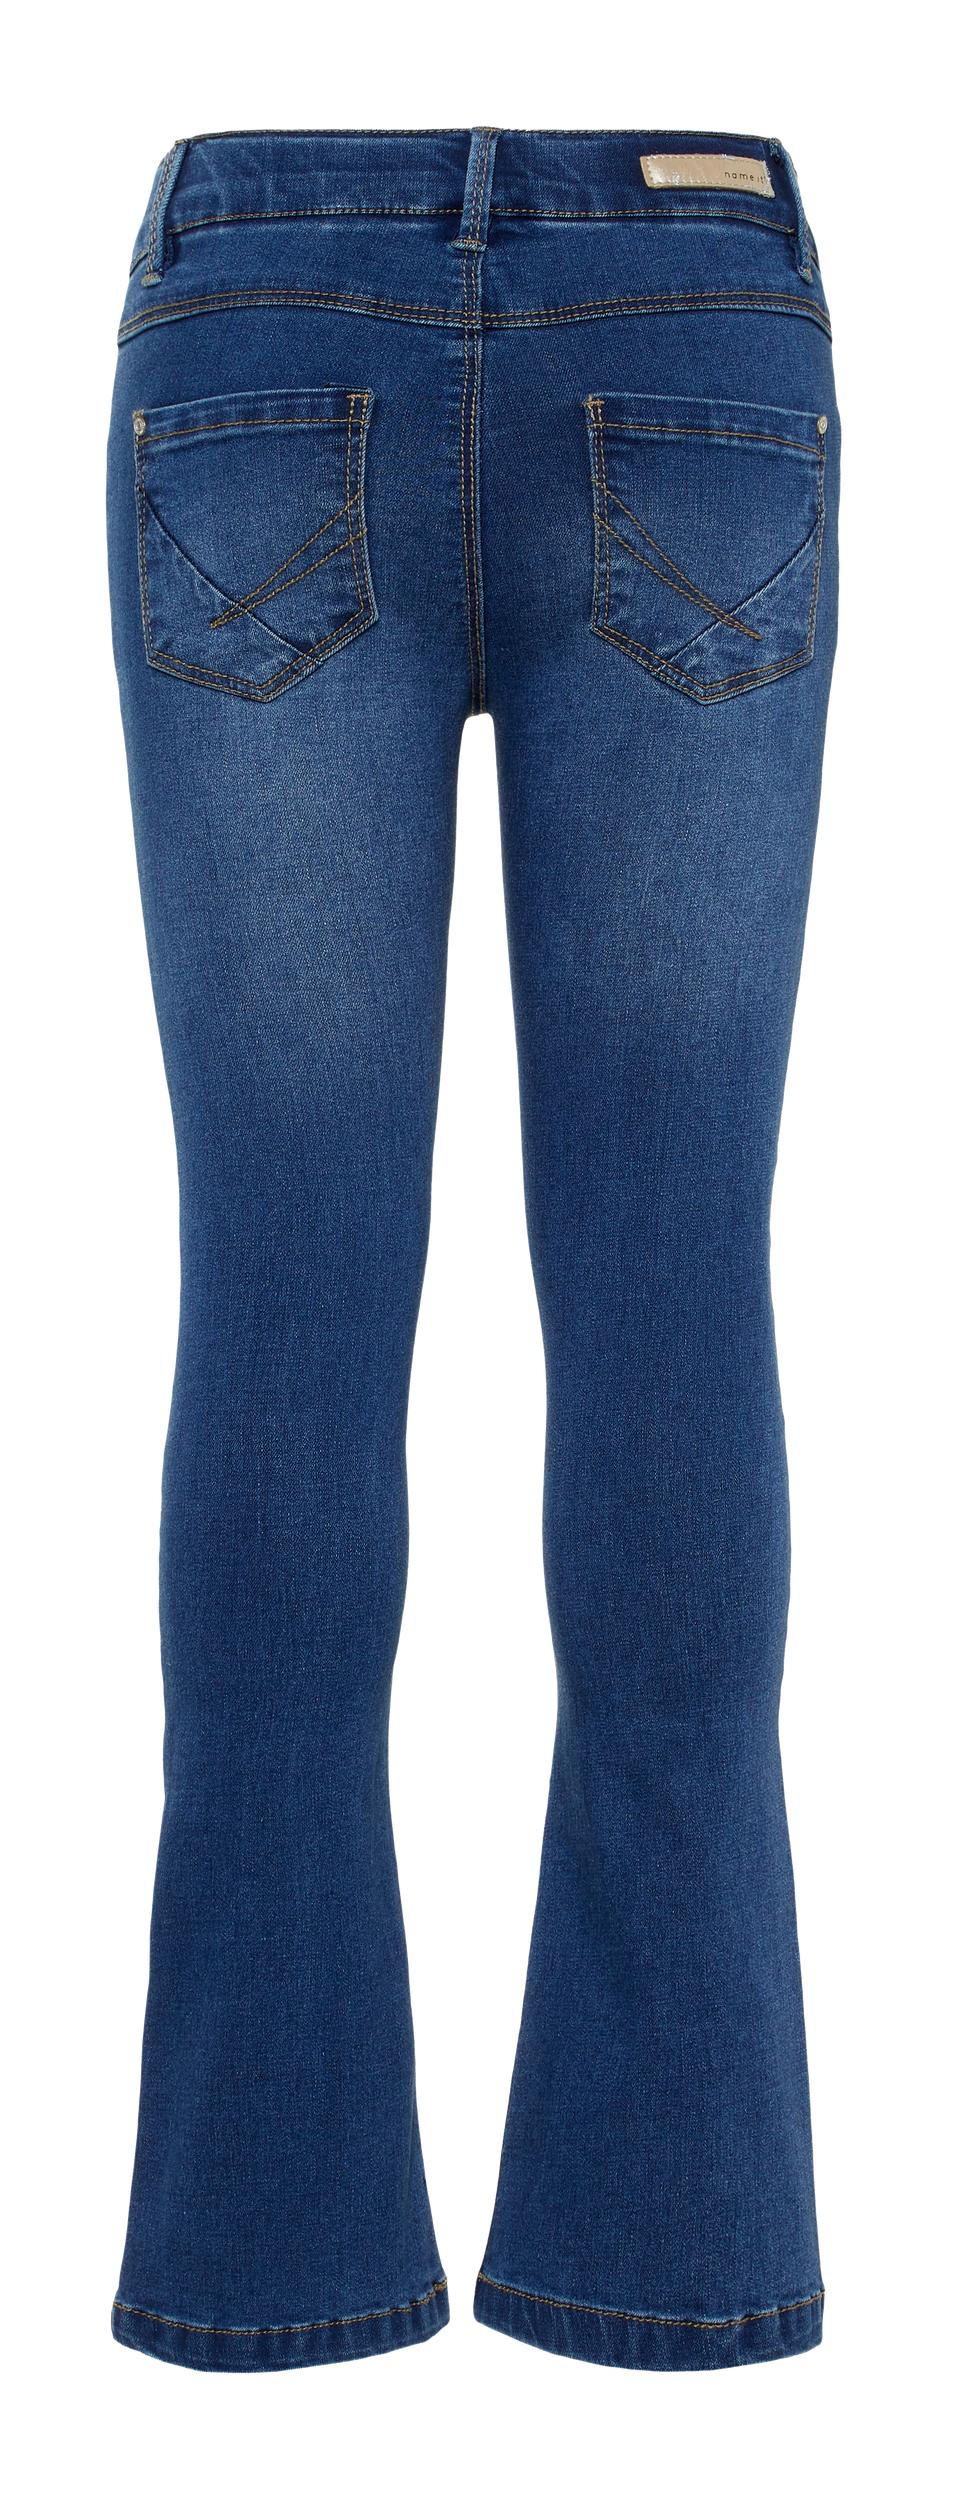 Name It Polly Digo jeans, dark blue denim, 122